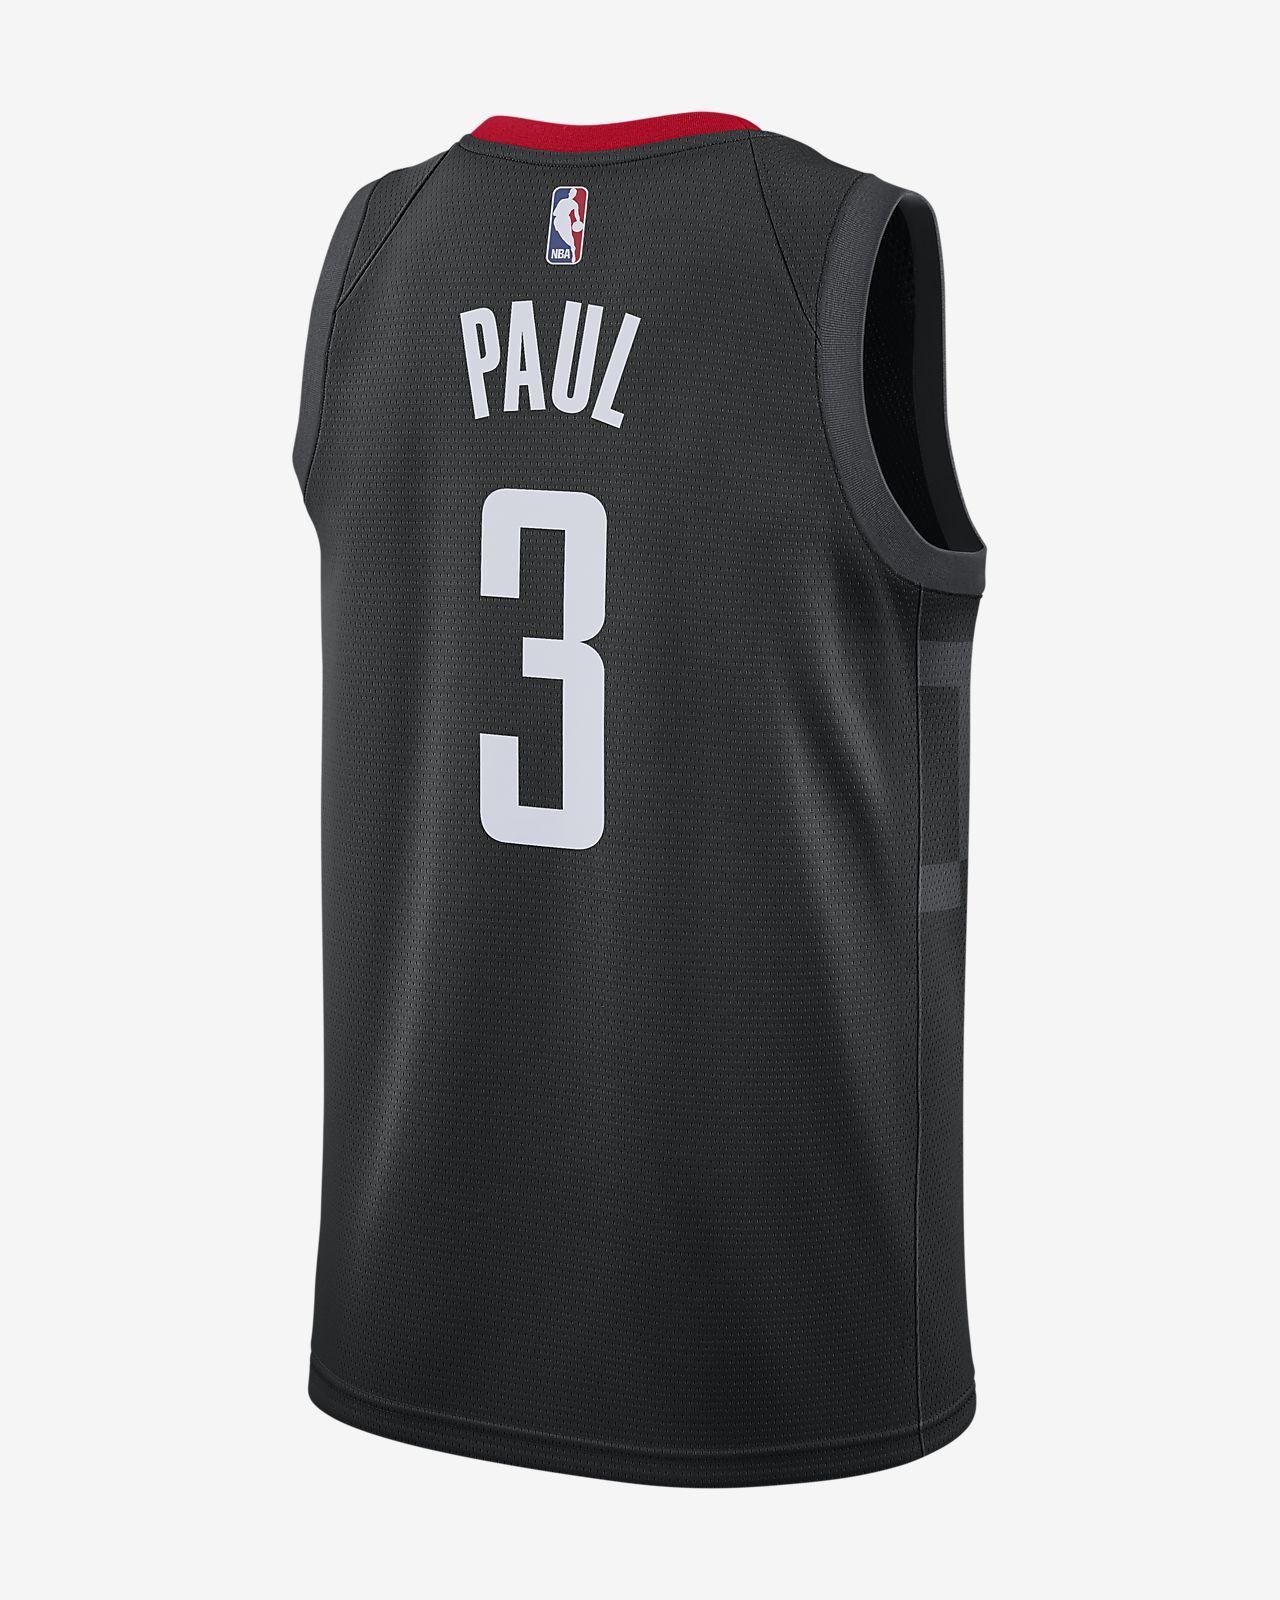 dcec7715e ... Chris Paul Statement Edition Swingman (Houston Rockets) Men s Nike NBA  Connected Jersey